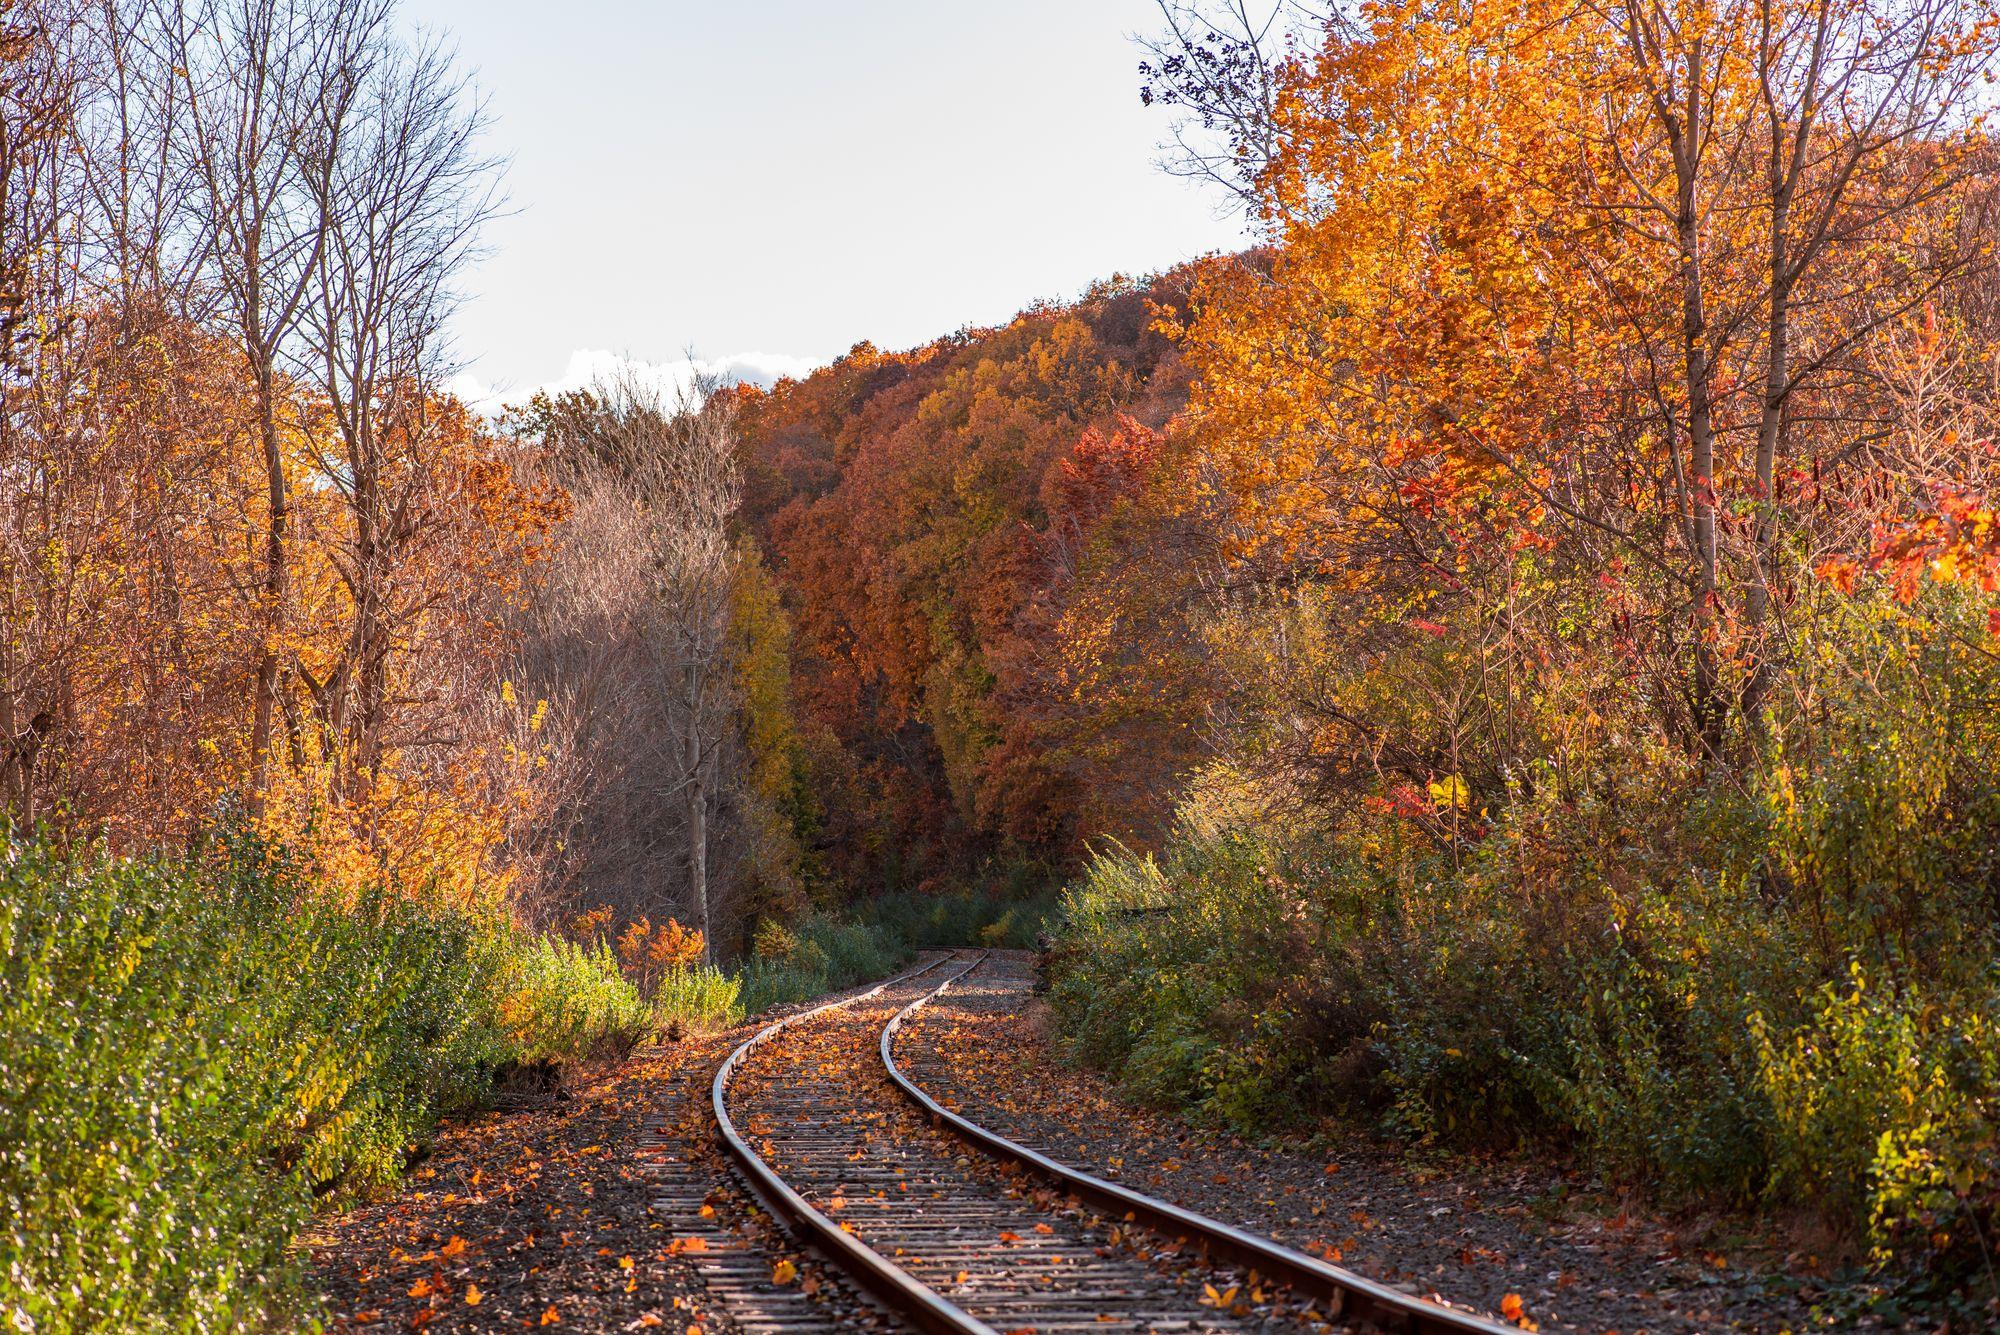 Michigan Railroad in the fall